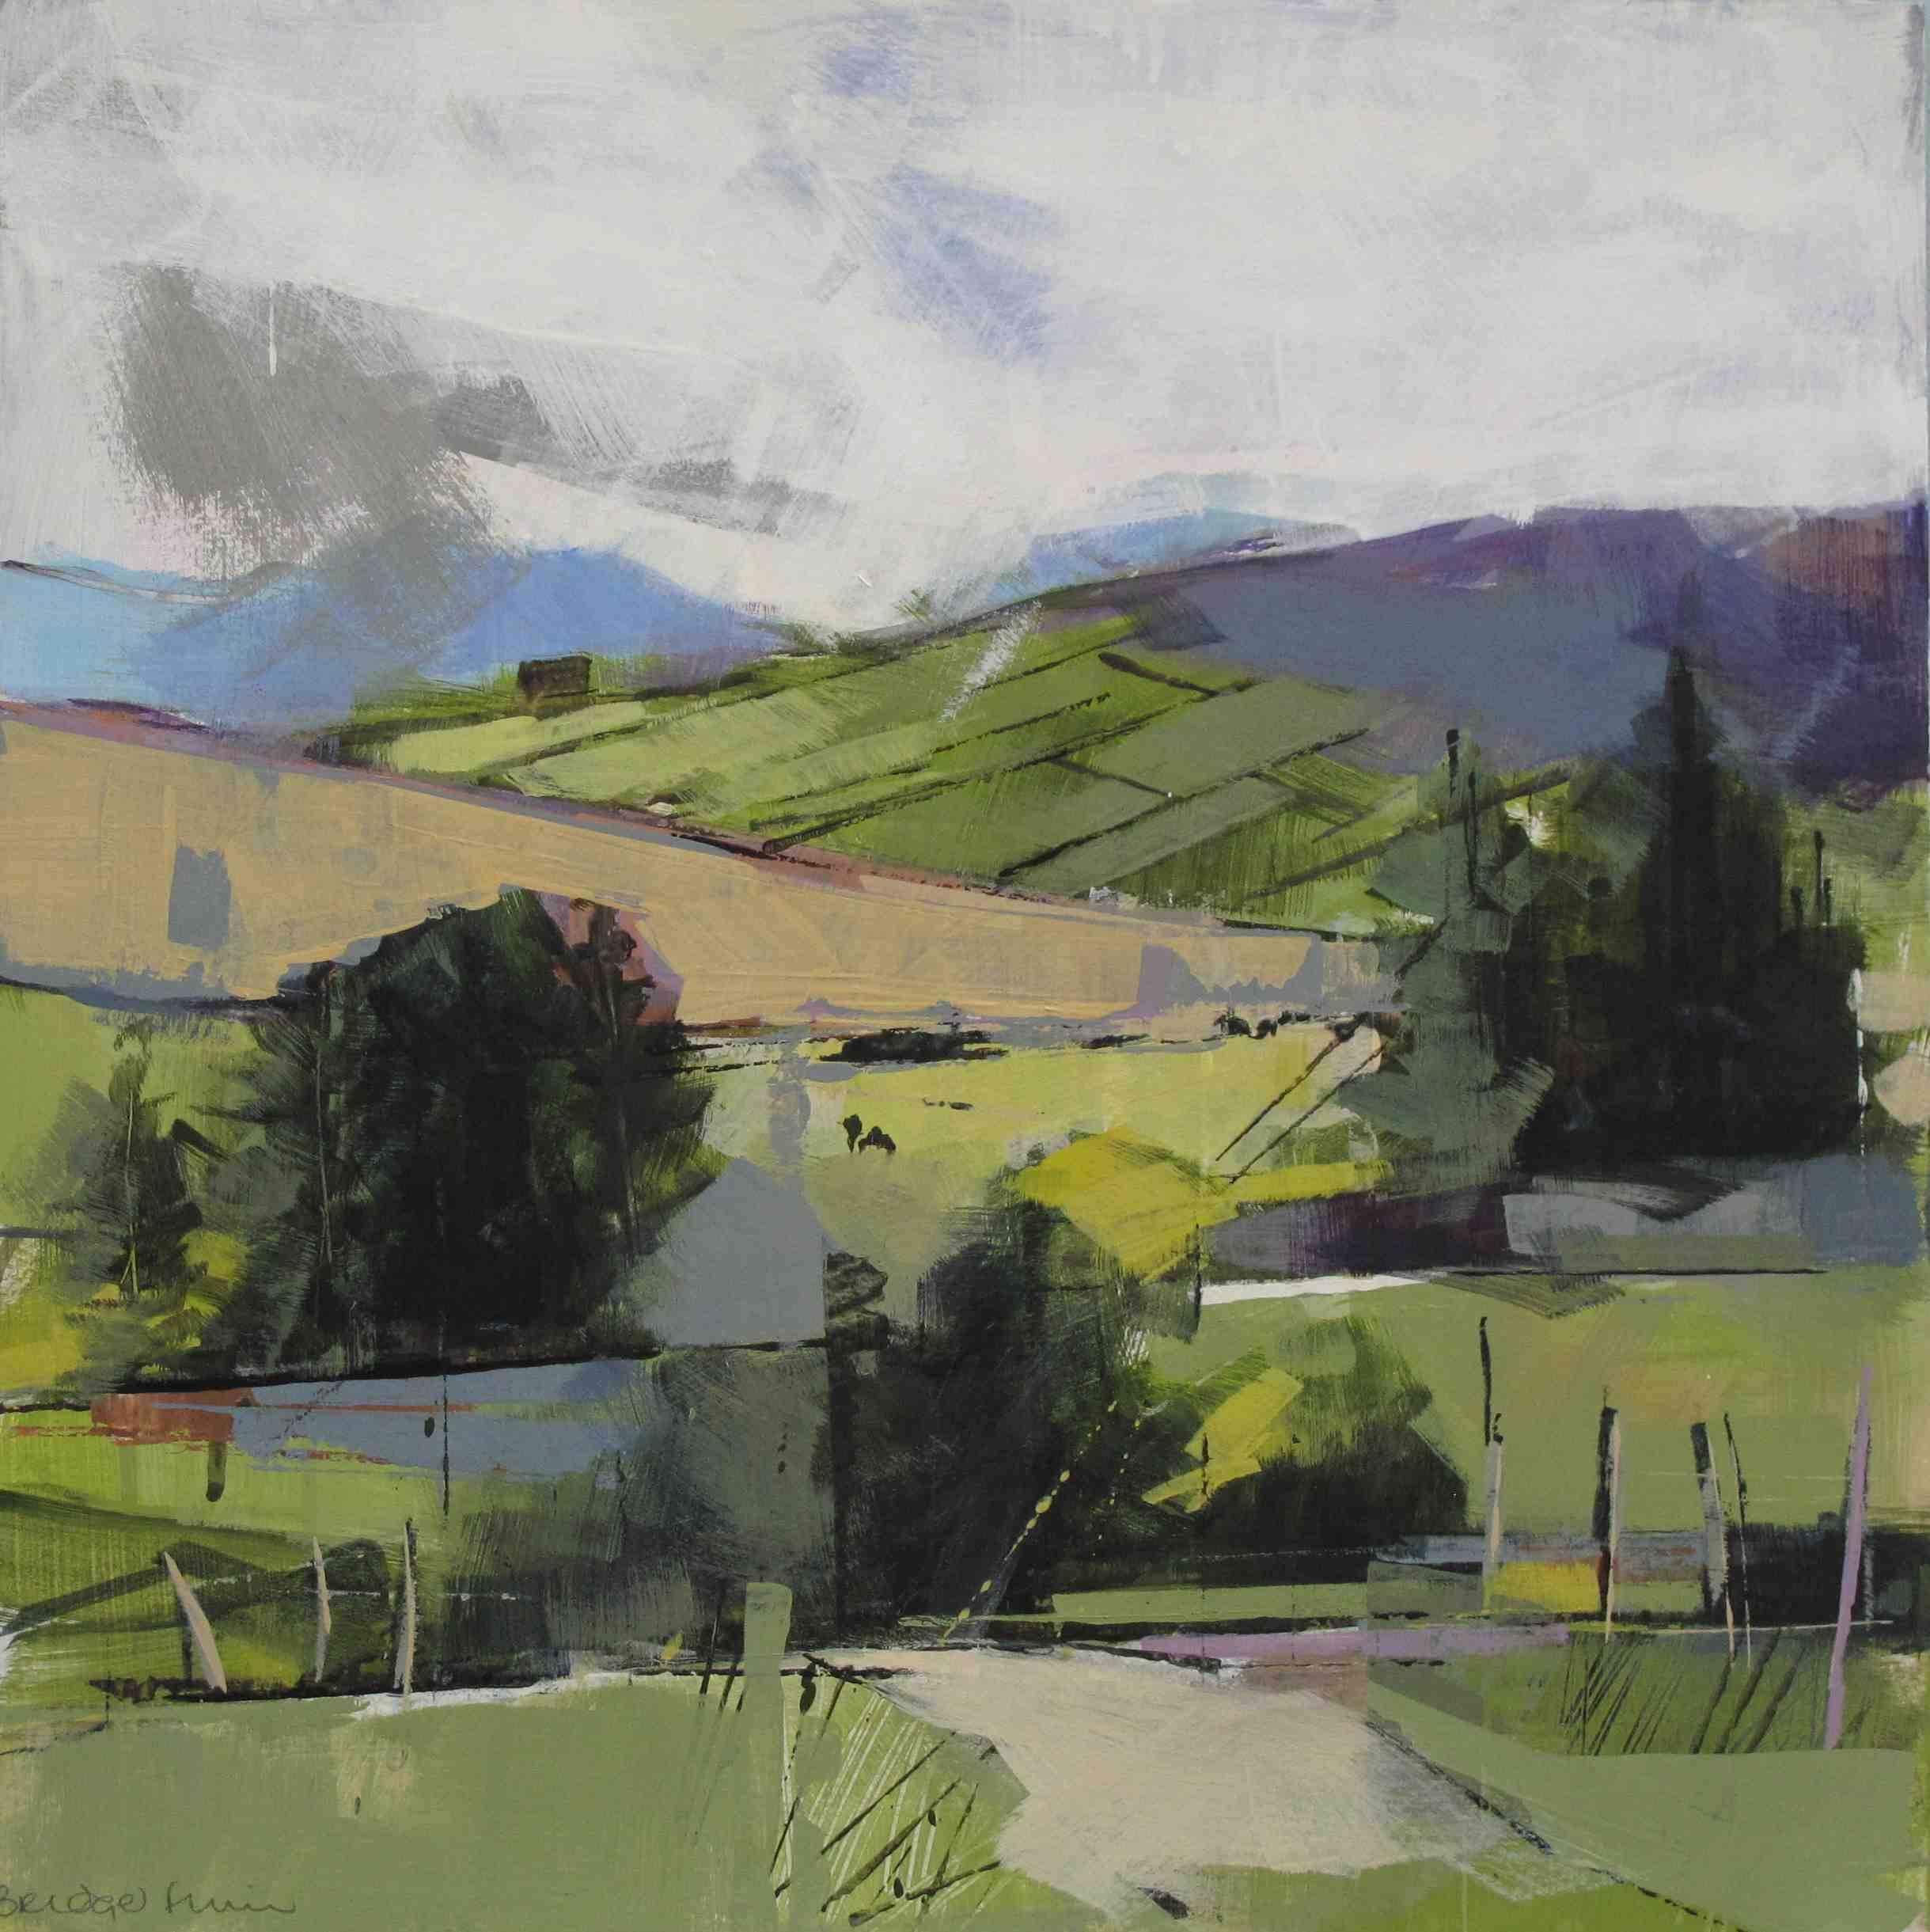 Bridget Flinn, Mayo Fields, acrylic on paper, 38 x 38 cm